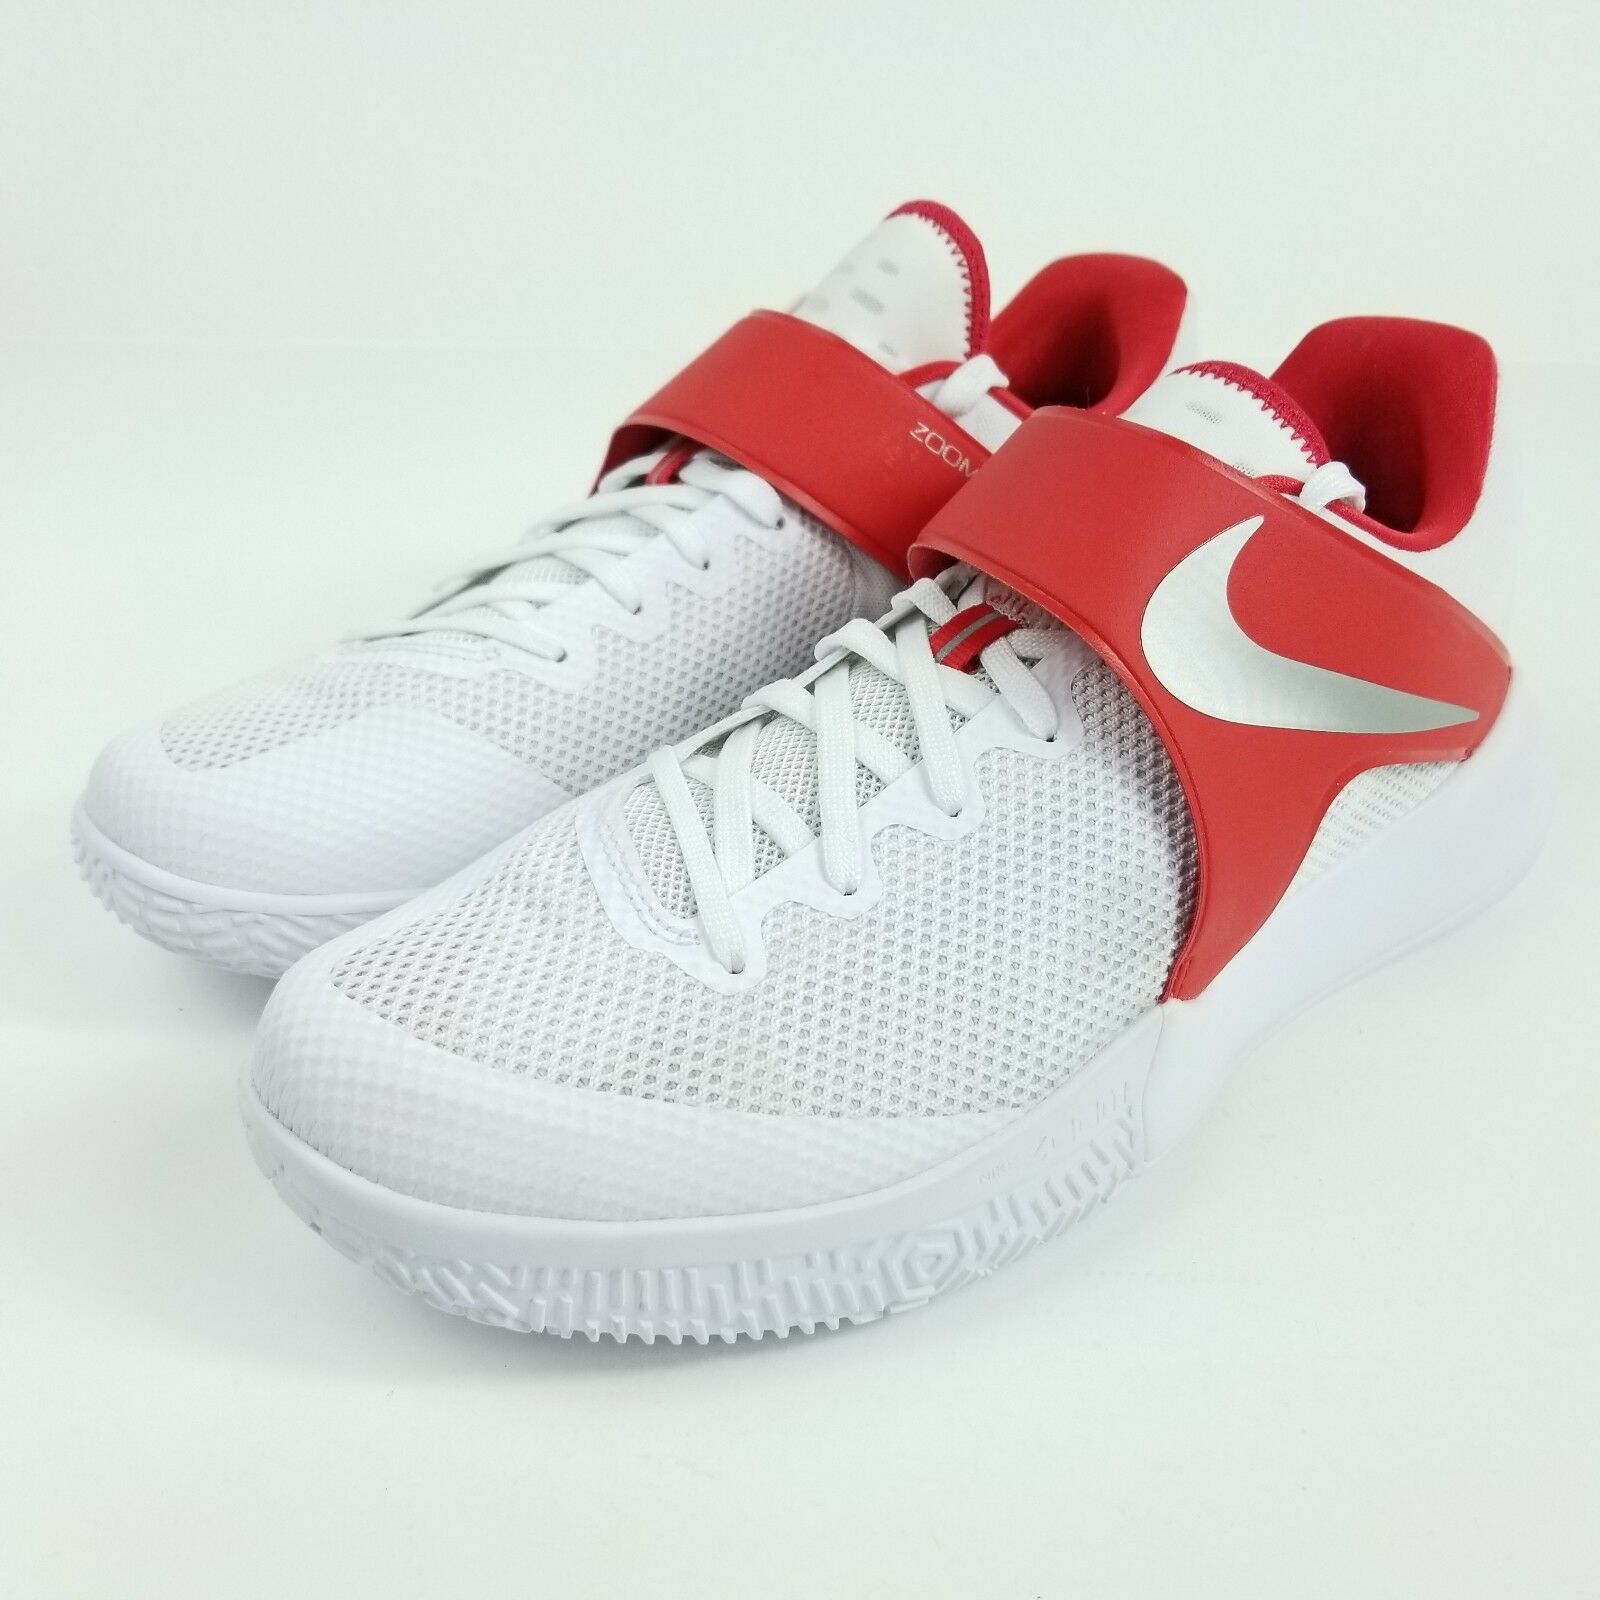 NIKE Zoom Live TB Promo Mens Mens Mens Sz 13.5 shoes White Red 902590 160 e50d34